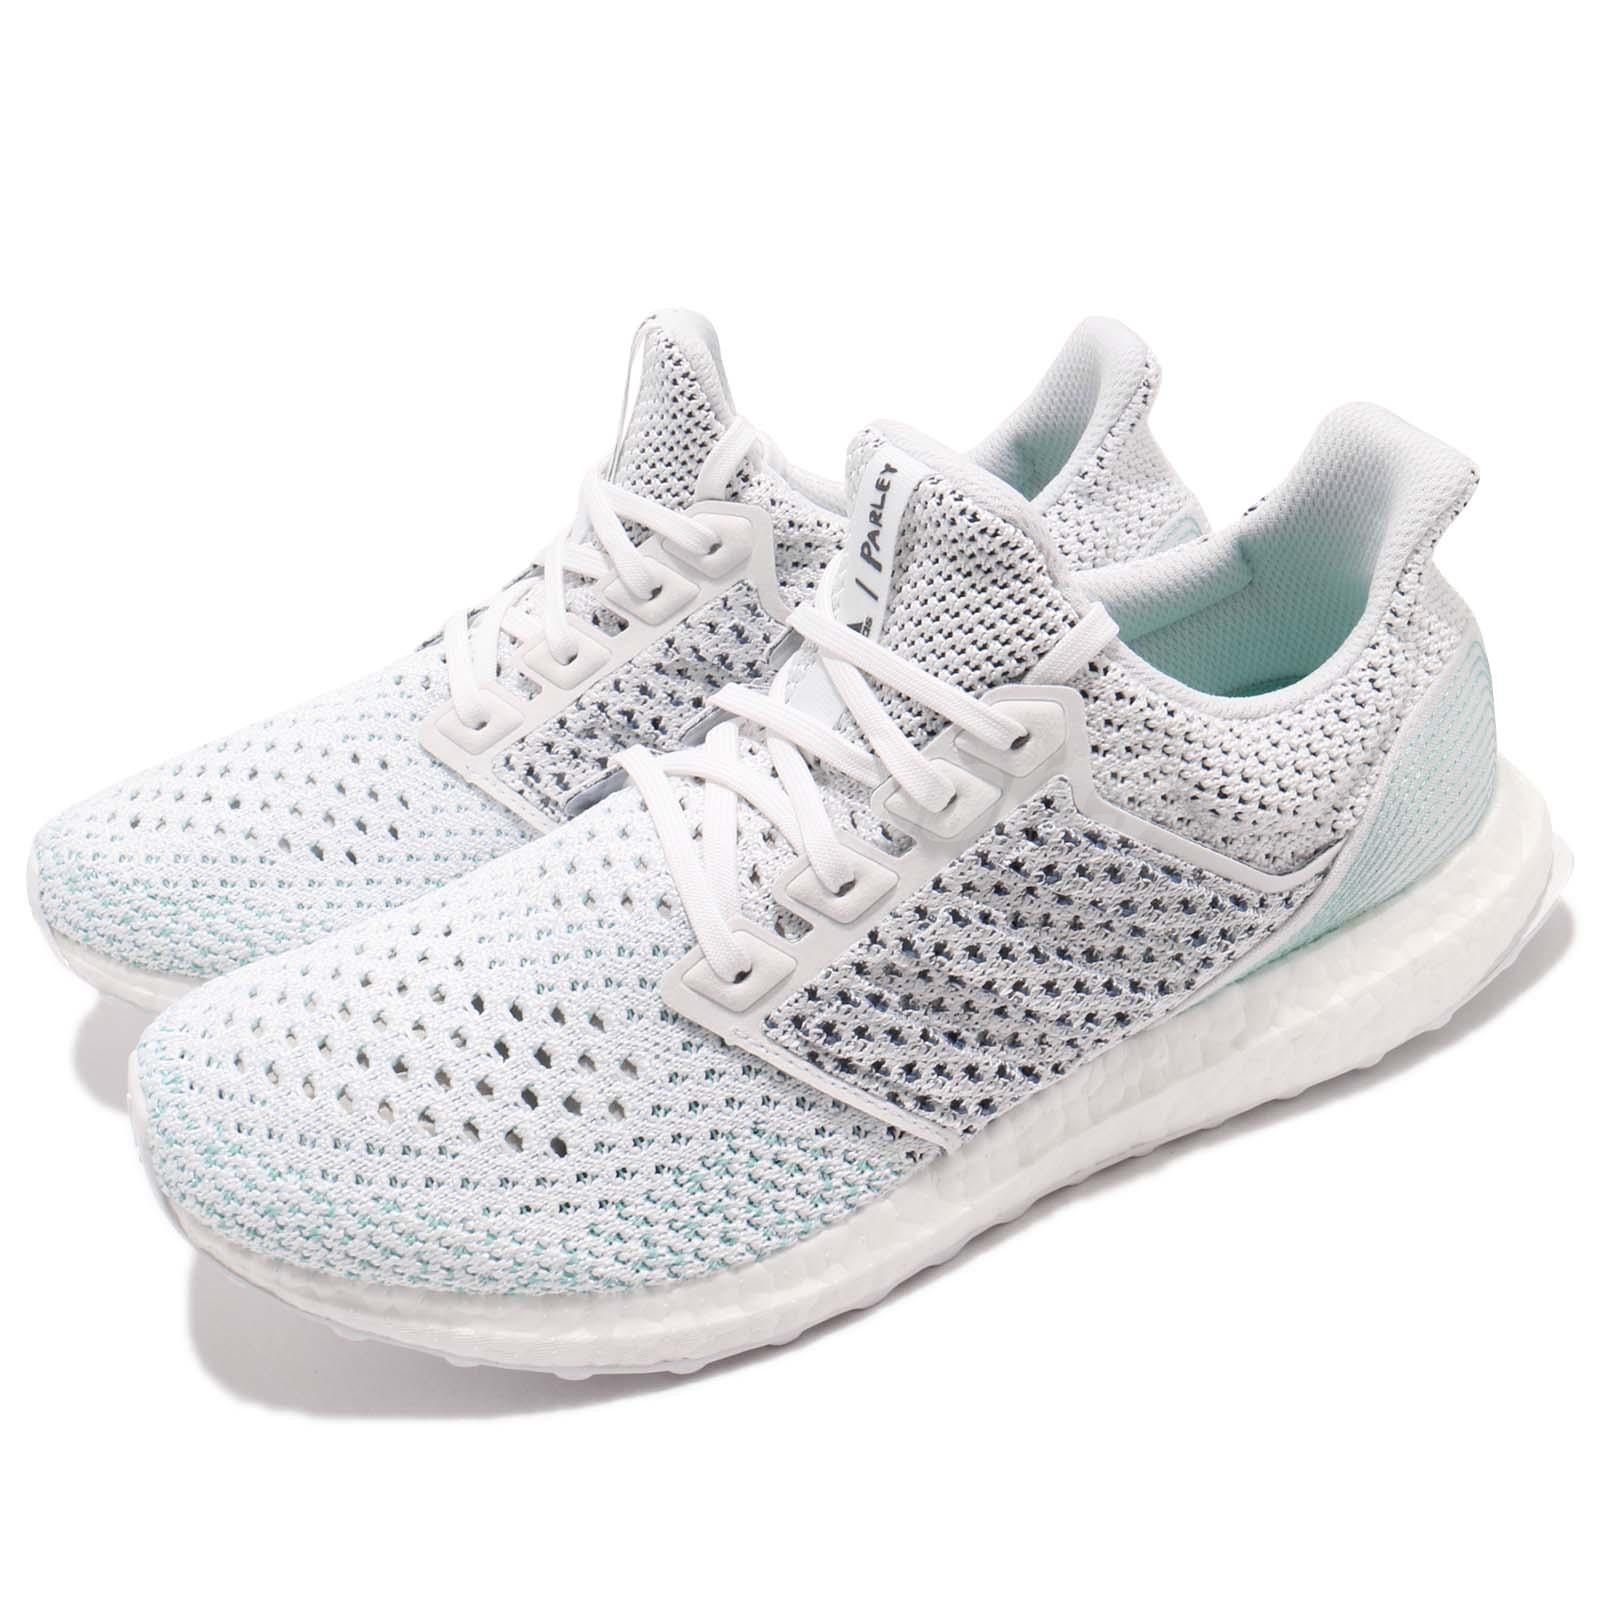 on sale fb077 4d25a Details about adidas UltraBOOST Parley LTD 4.0 Cloud Footwear White Blue  Spirit Men BB7076